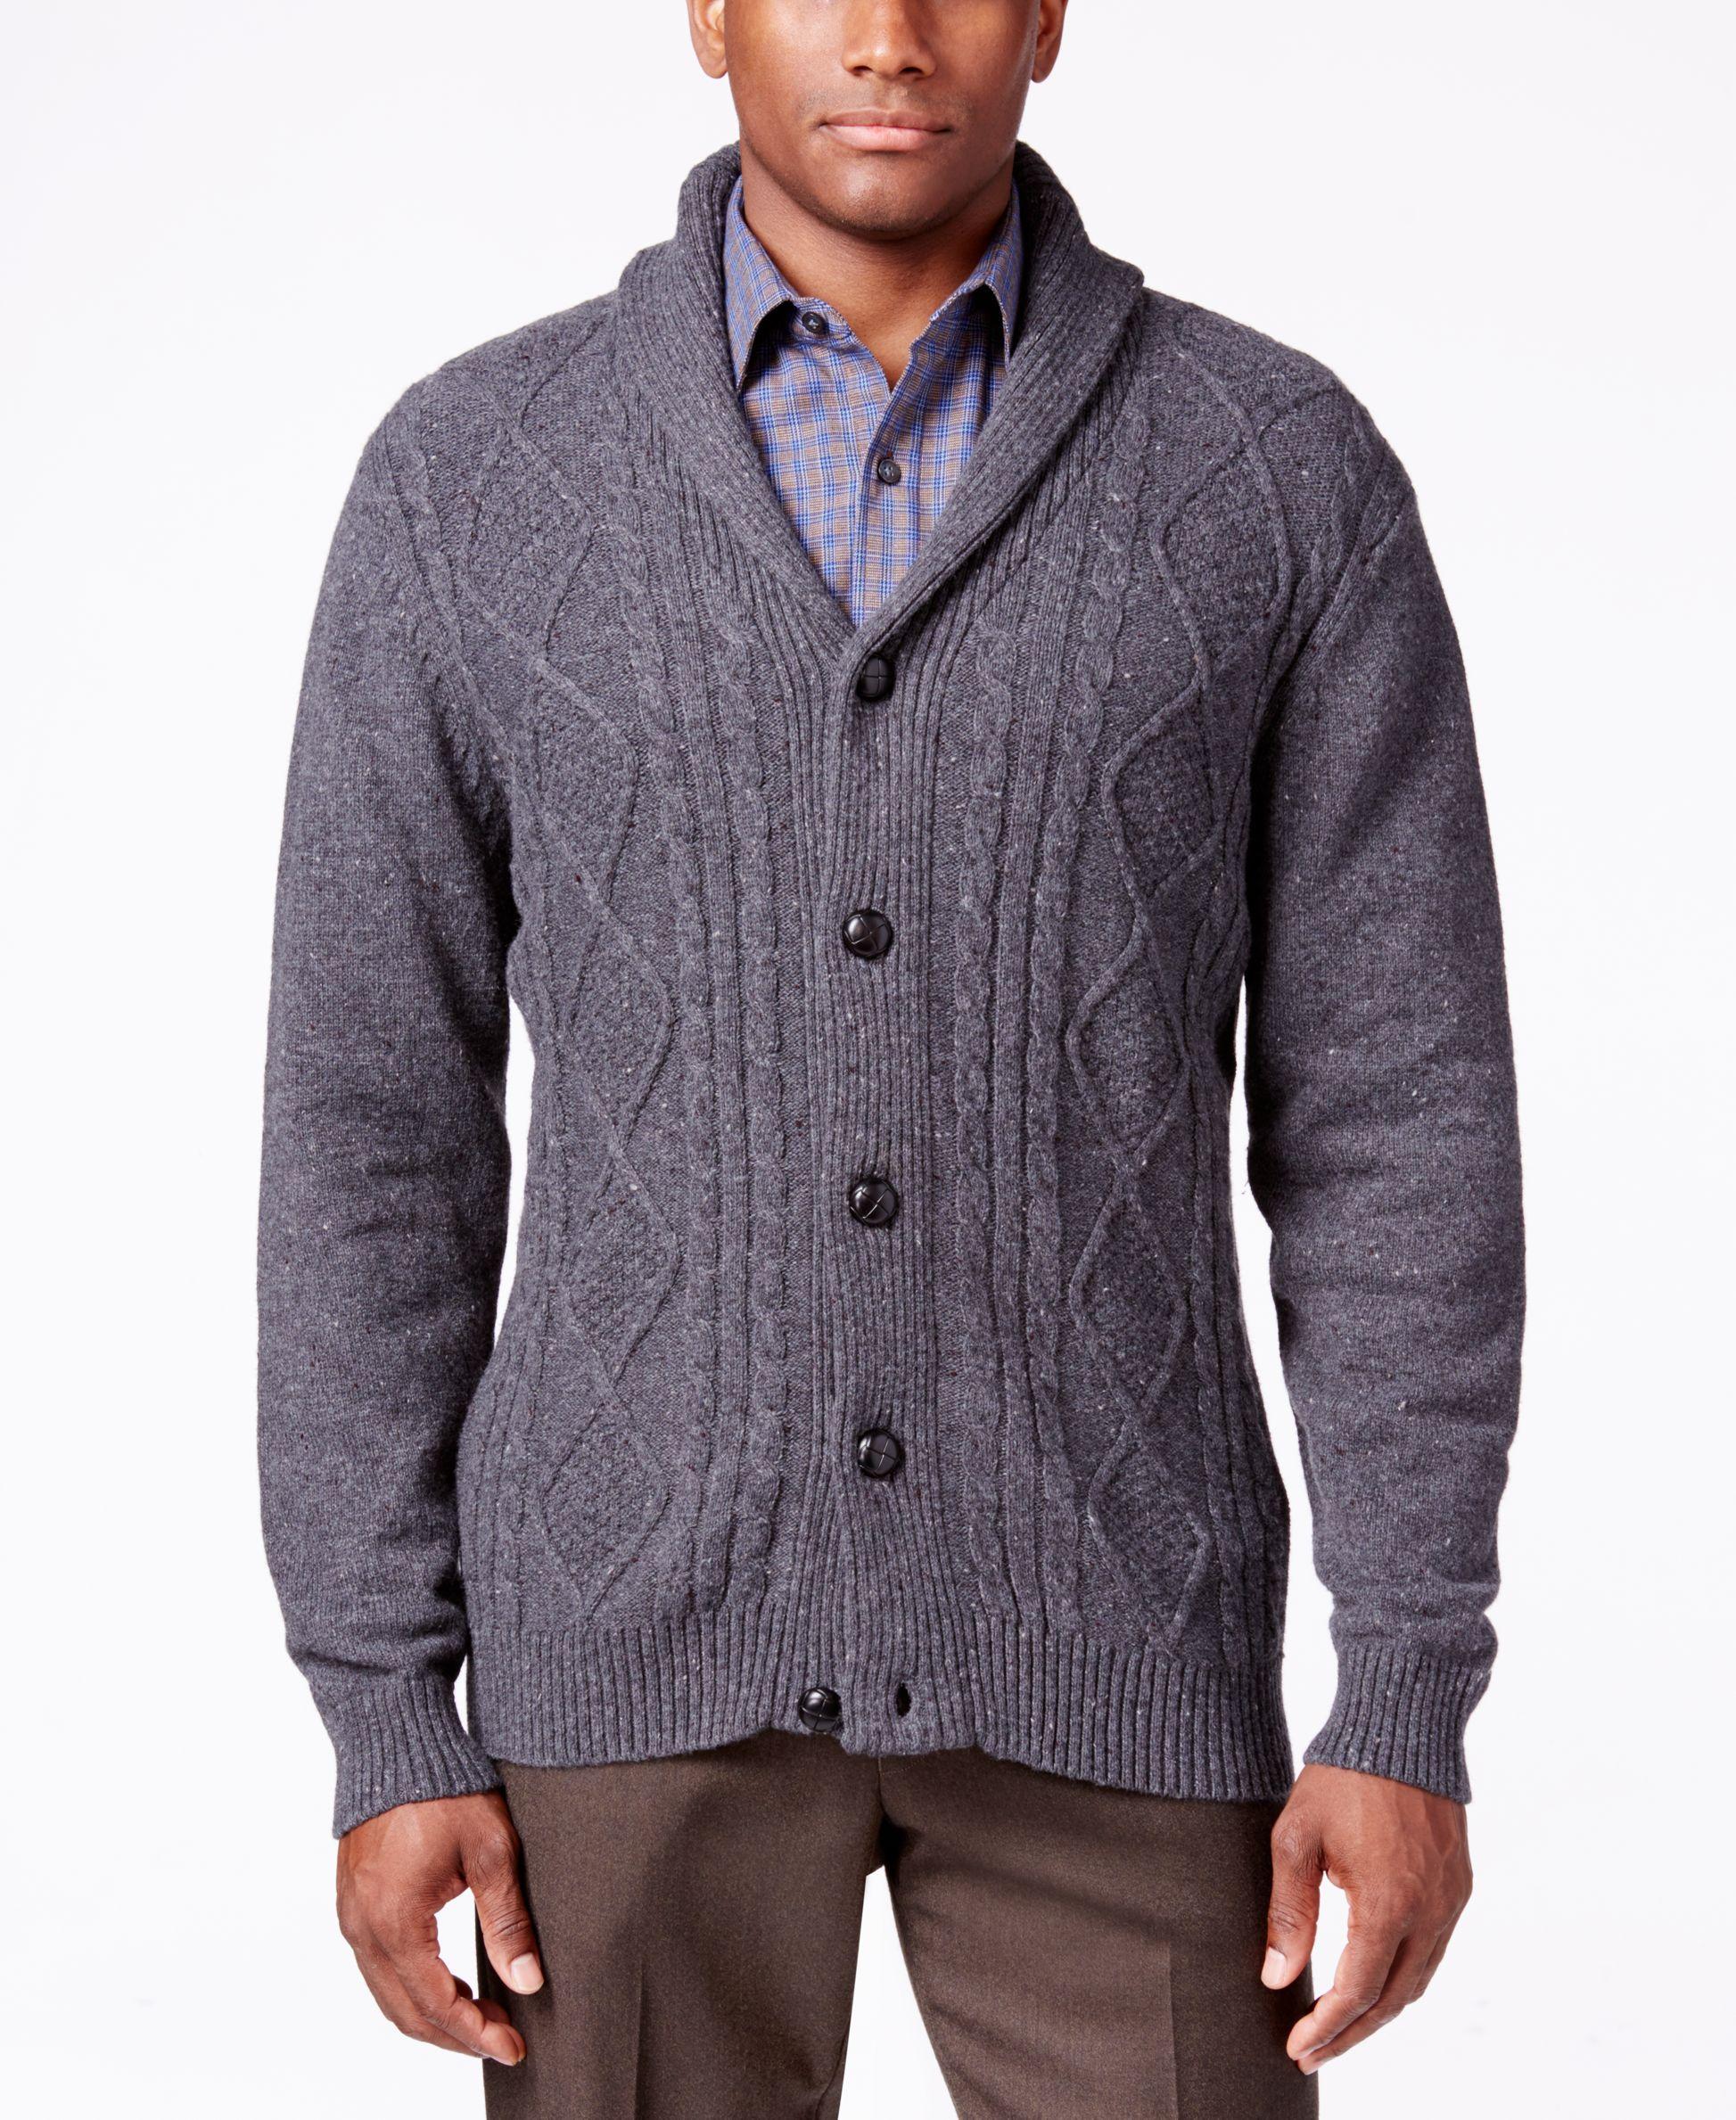 35b086965 Tricots St. Raphael Men s Cable-Knit Shawl-Collar Cardigan ...